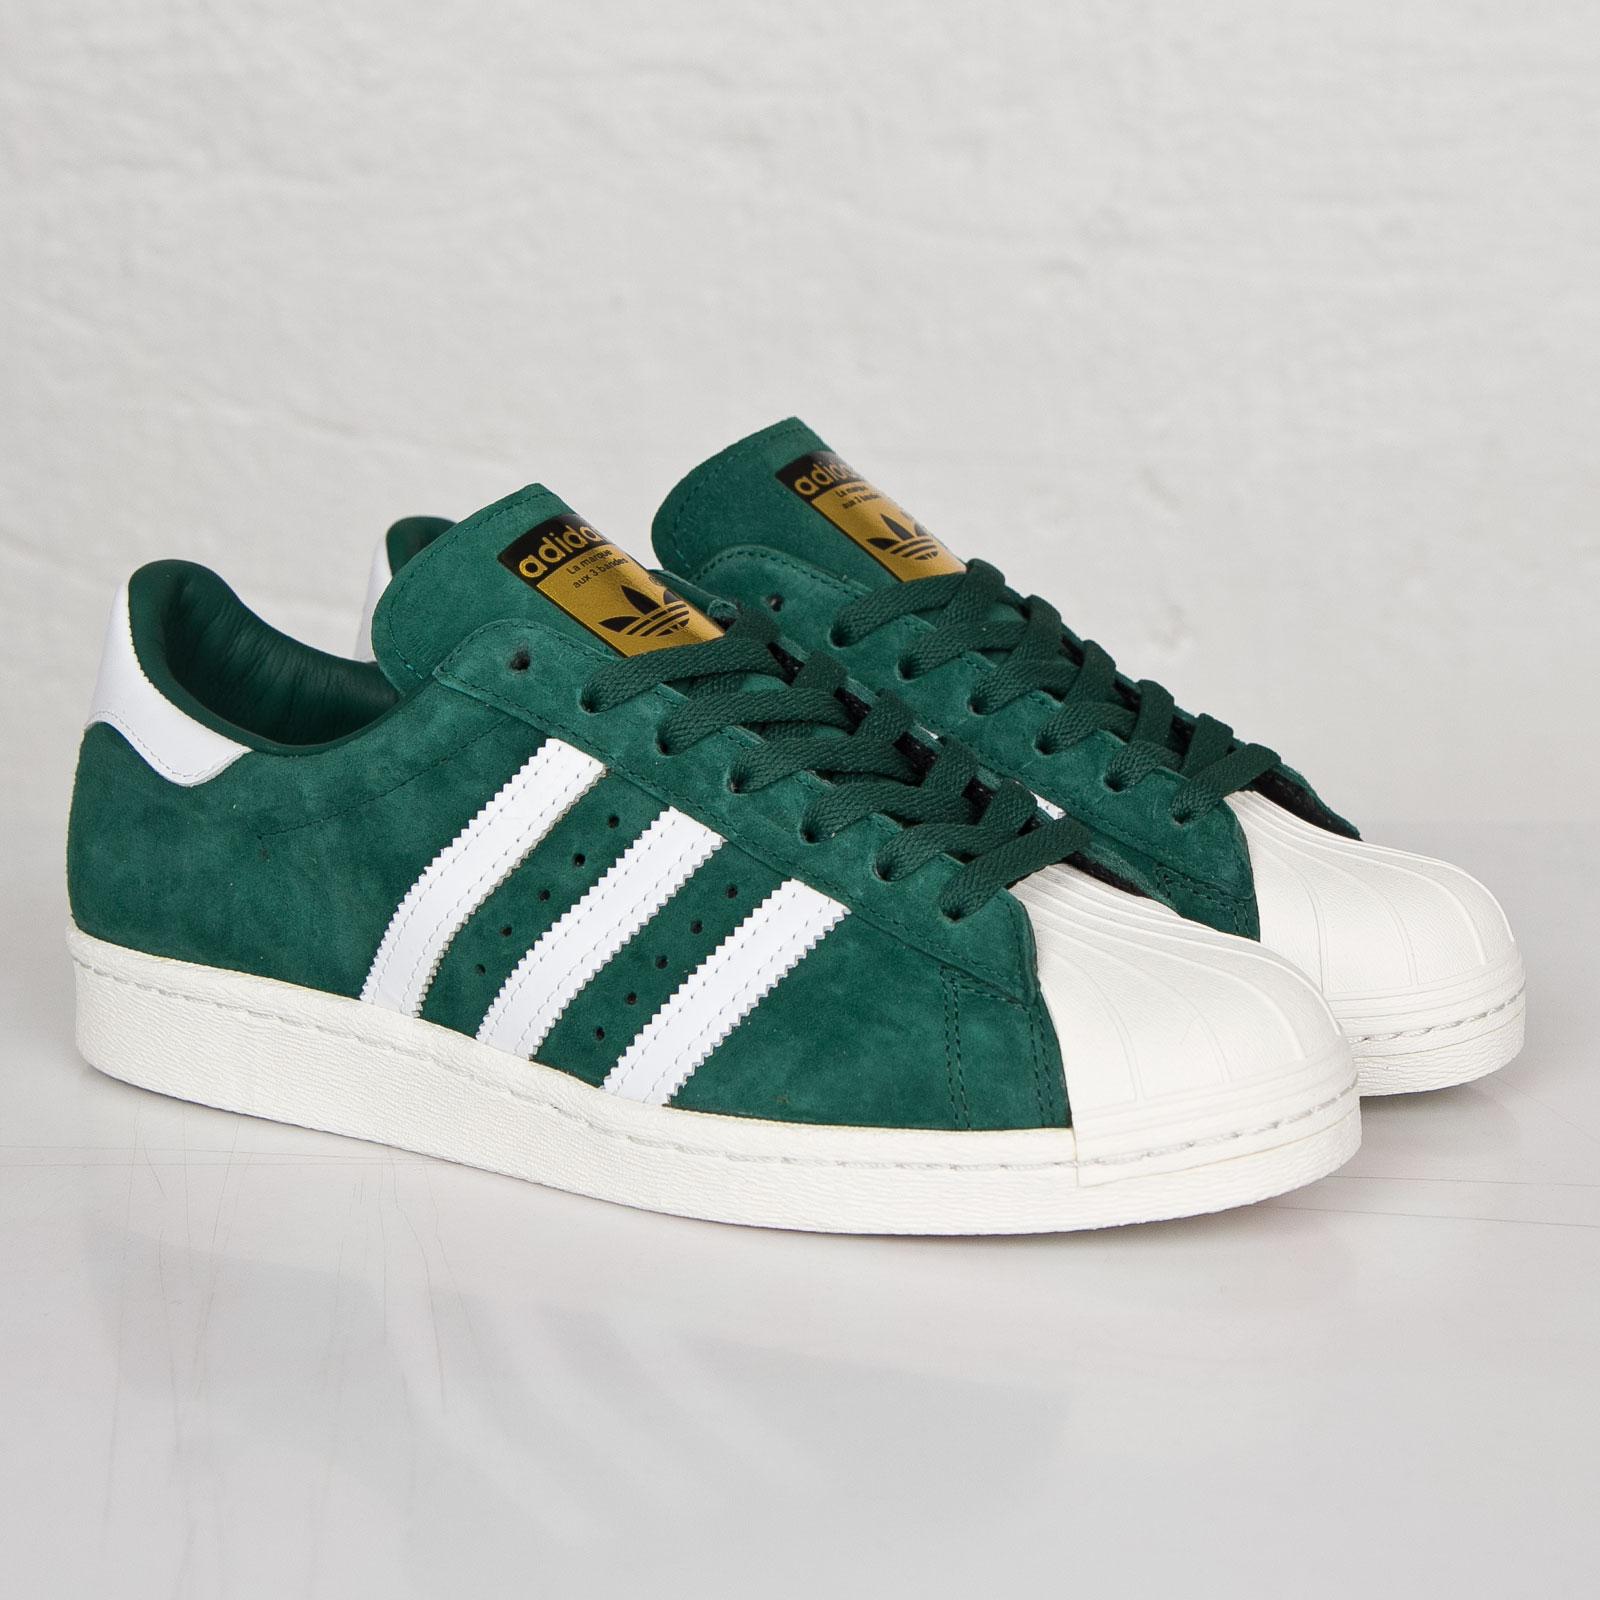 adidas superstar 80s verde